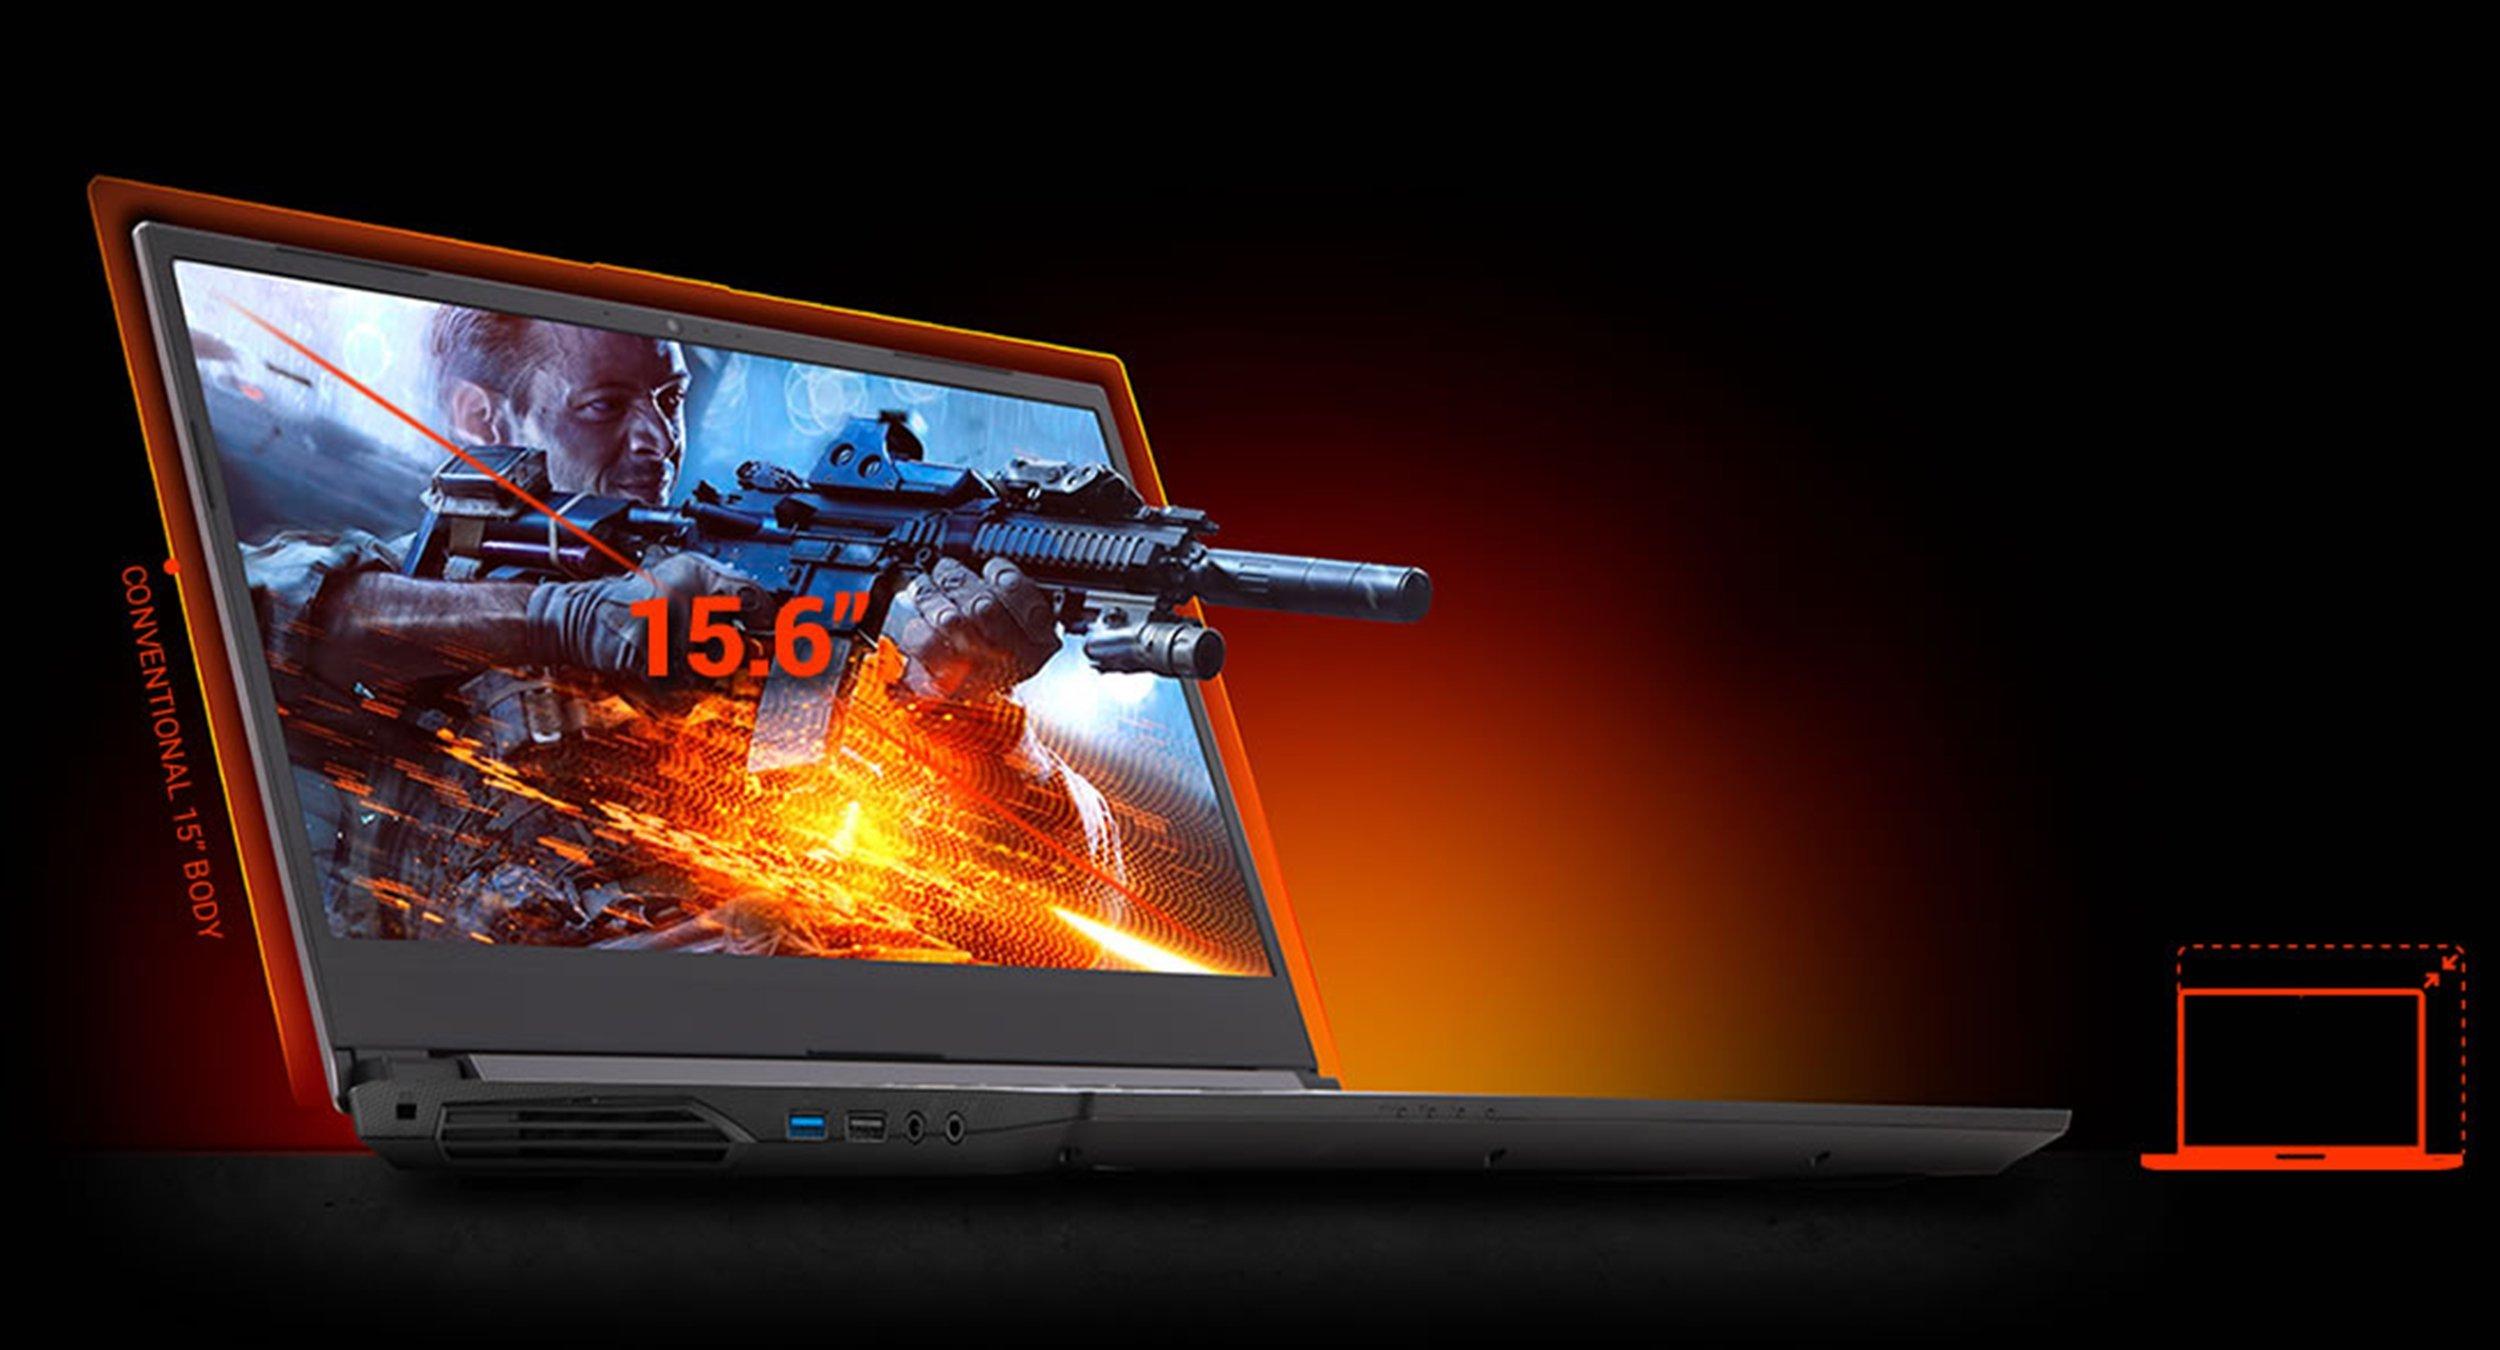 CLEVO-Computer-NH58EDQ-NVIDIA-RTX-2060-Intel-Core-i7-Gaming-Laptop-Custom-Notebook-1